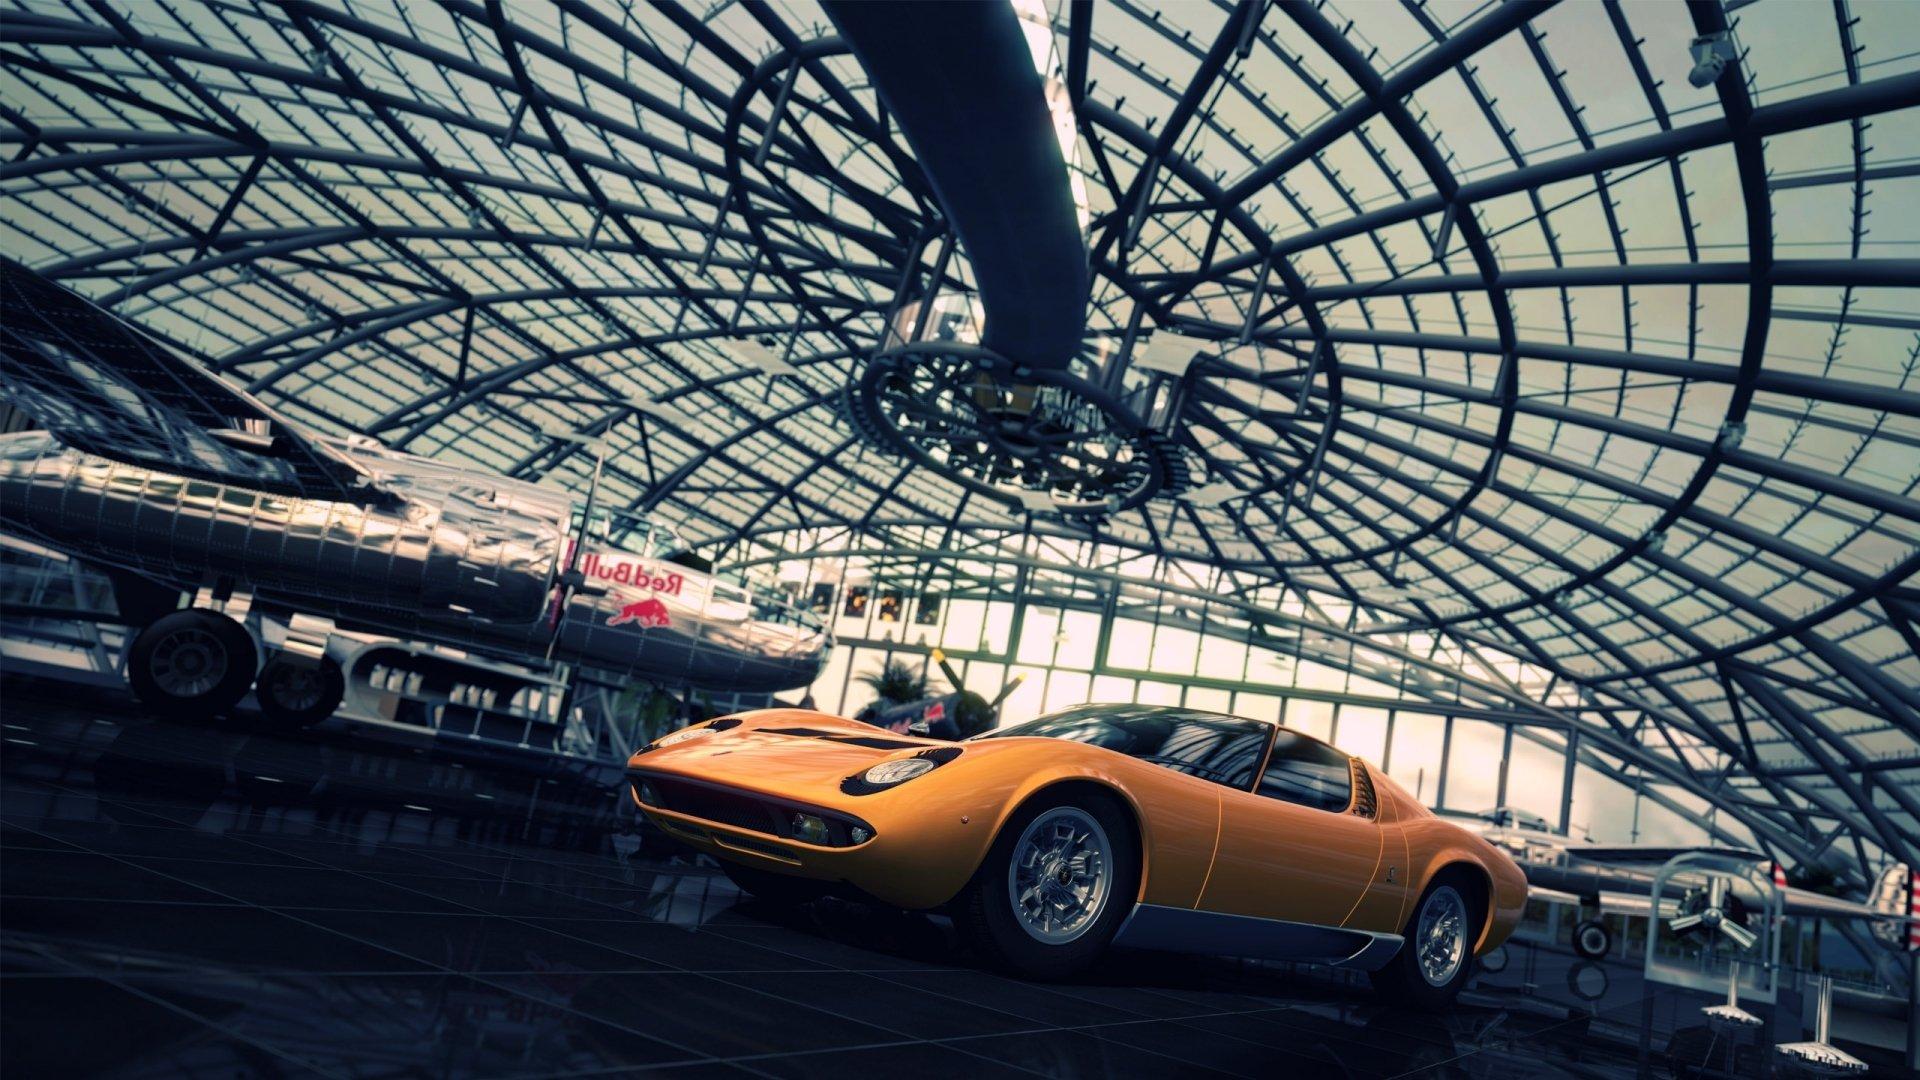 23 Lamborghini Miura Hd Wallpapers Background Images Wallpaper Abyss